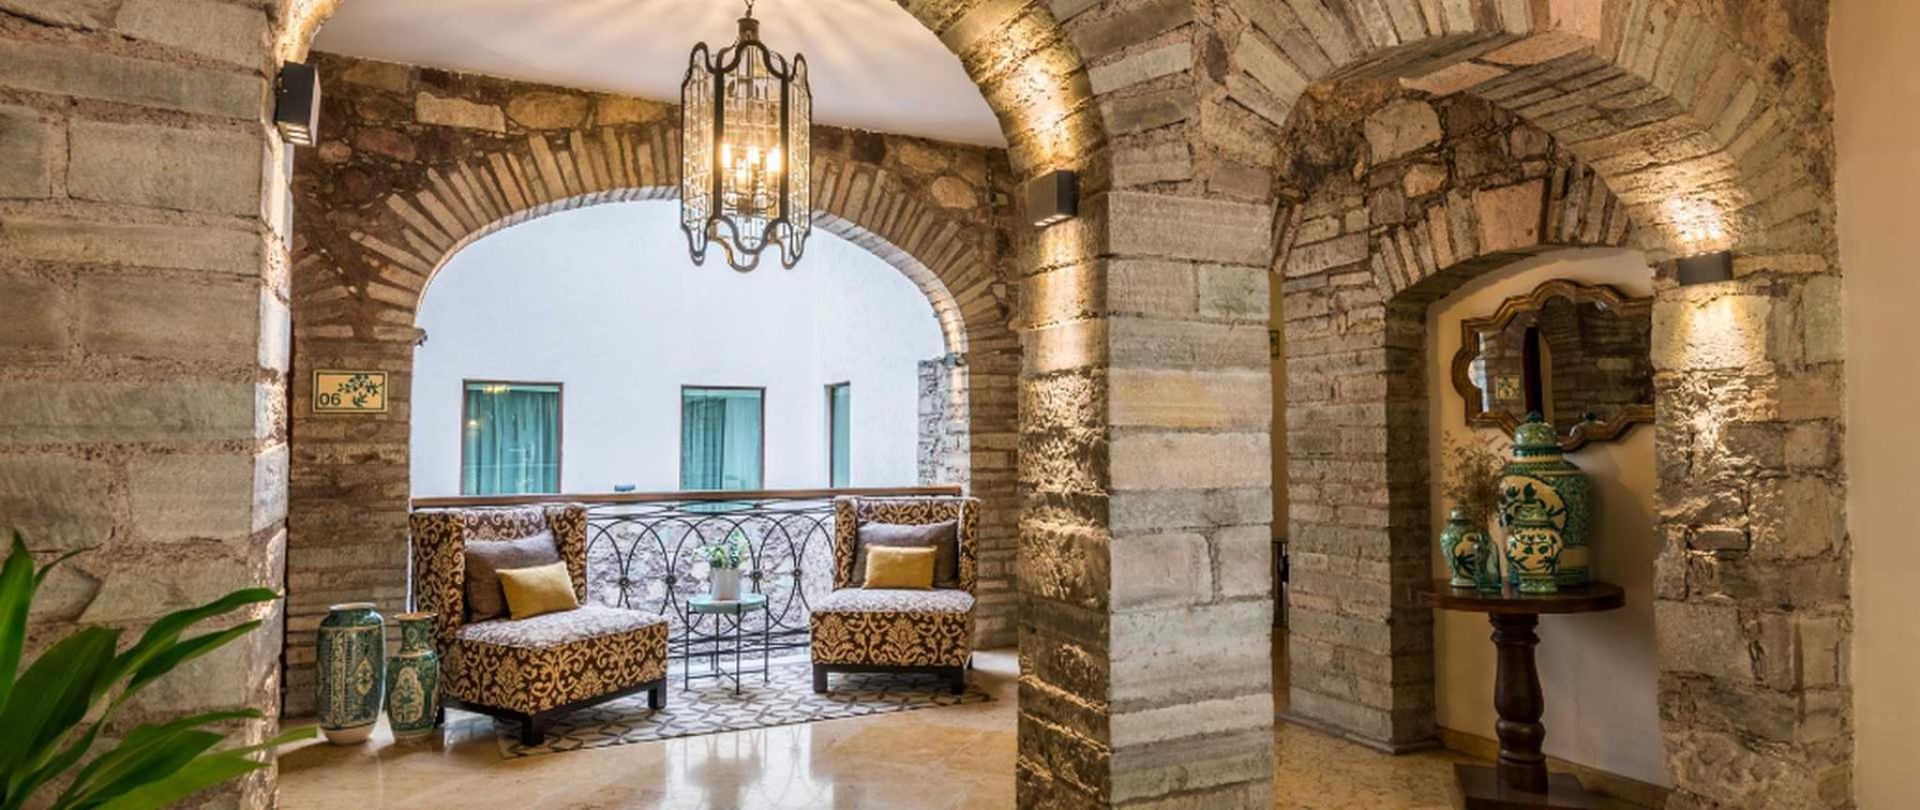 homepage-hotel-edelmira-guanajuato8.jpeg